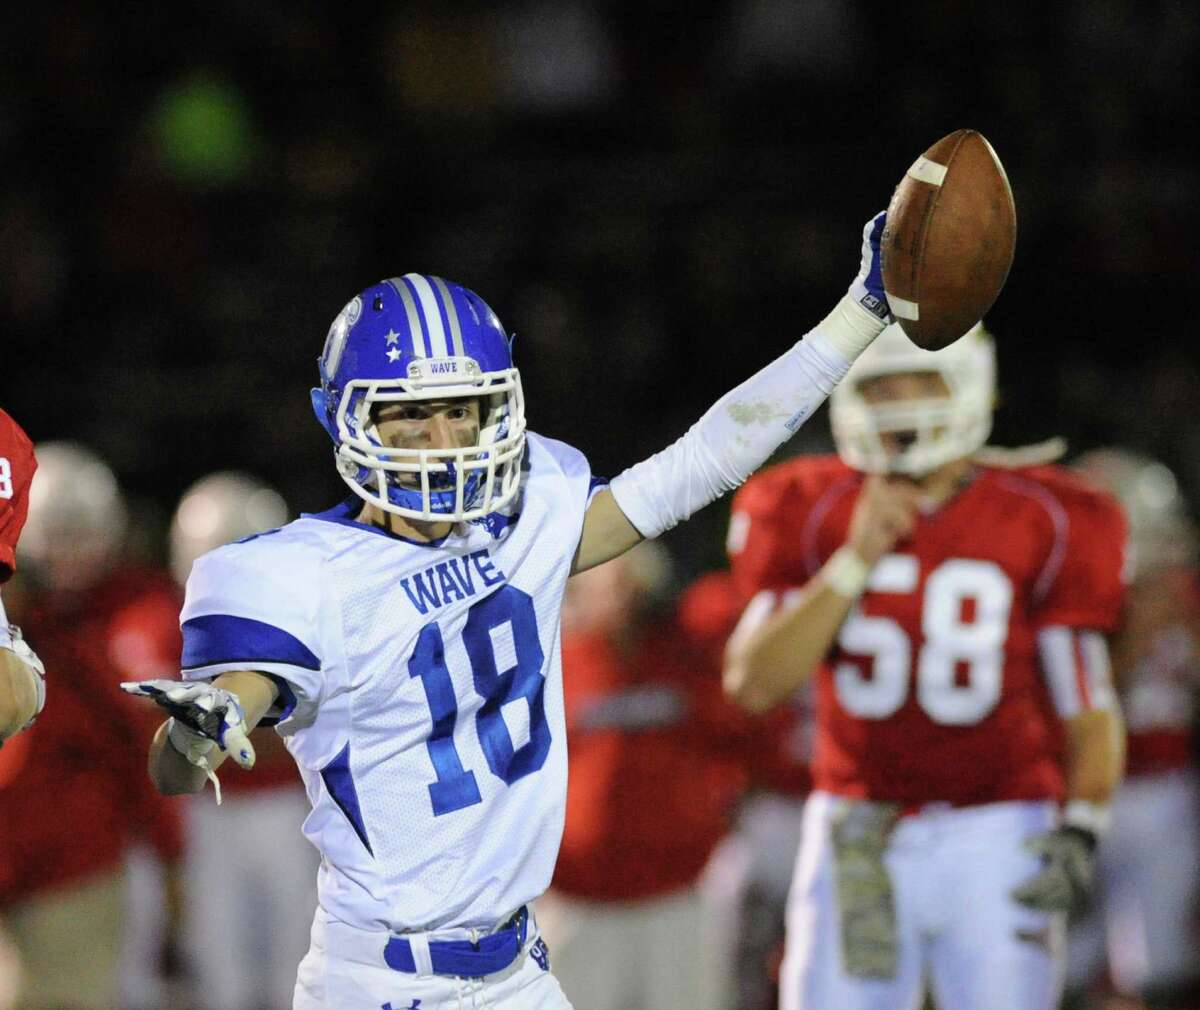 Tyler Grant (18) High school football game between Darien High School and Greenwich High School at Greenwich, Friday night, Sept. 19, 2014. Darien defeated Greenwich, 33-26.